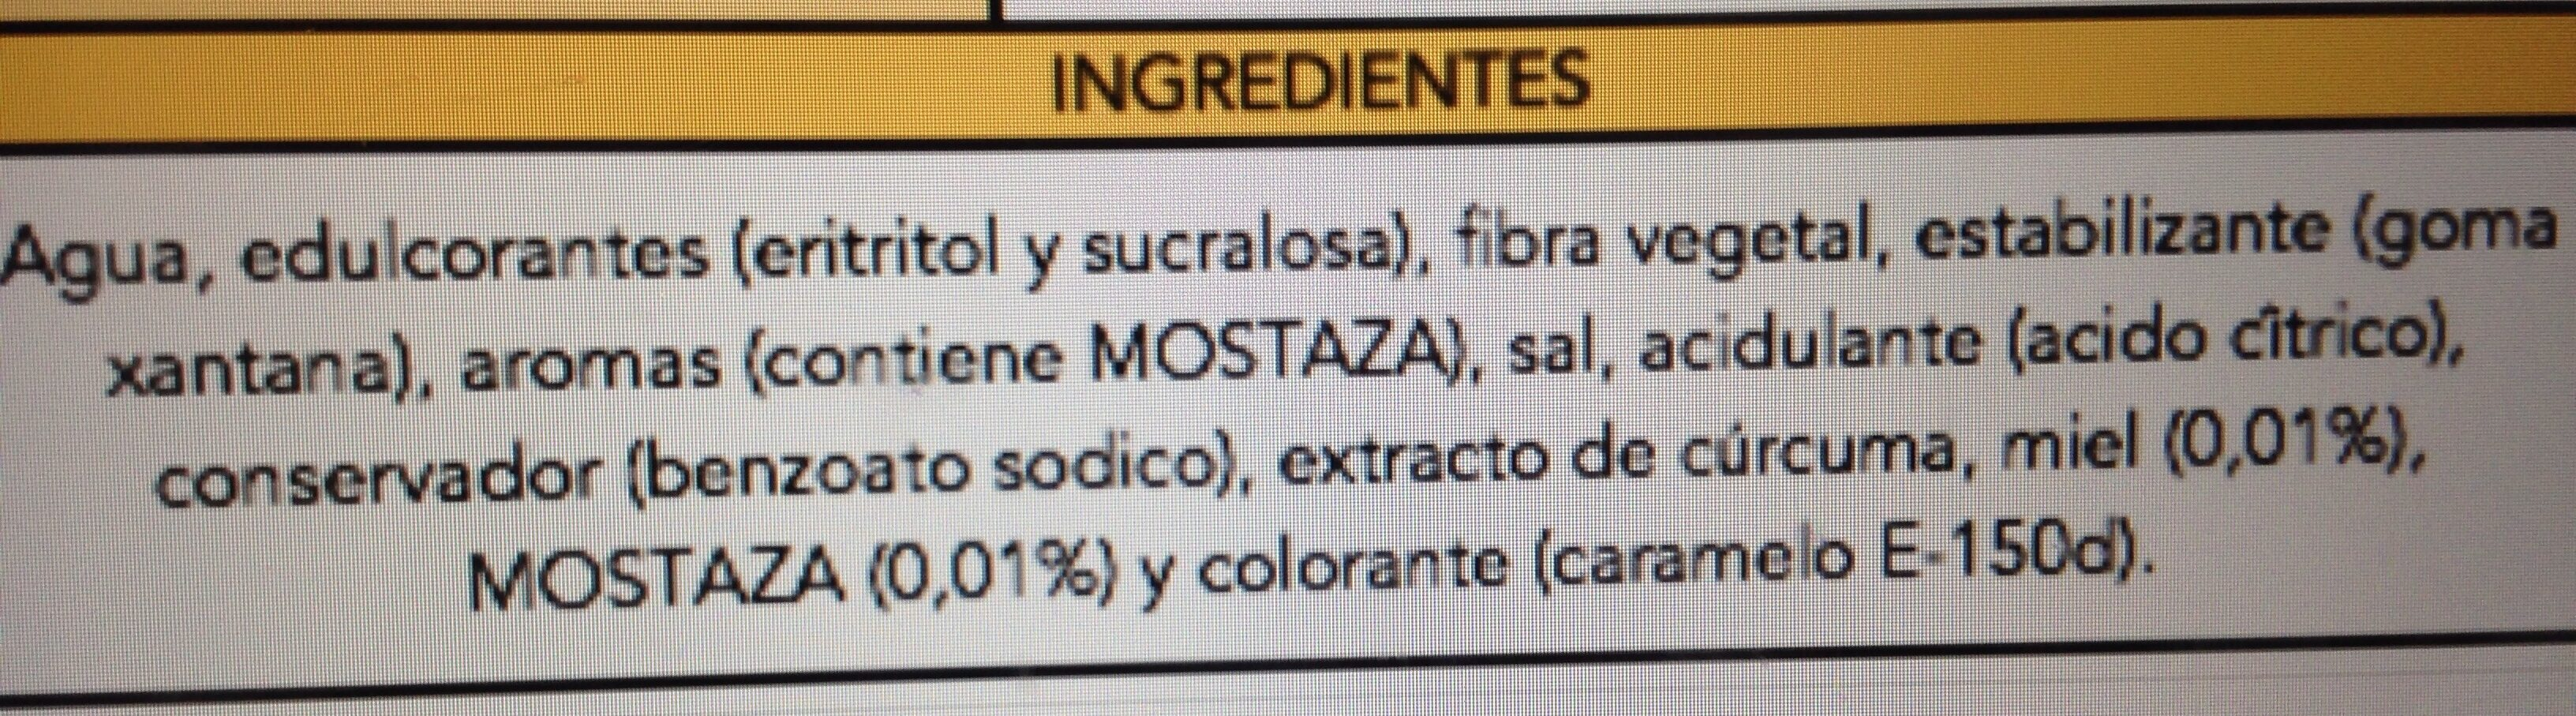 Honey Mustard - Ingredientes - es